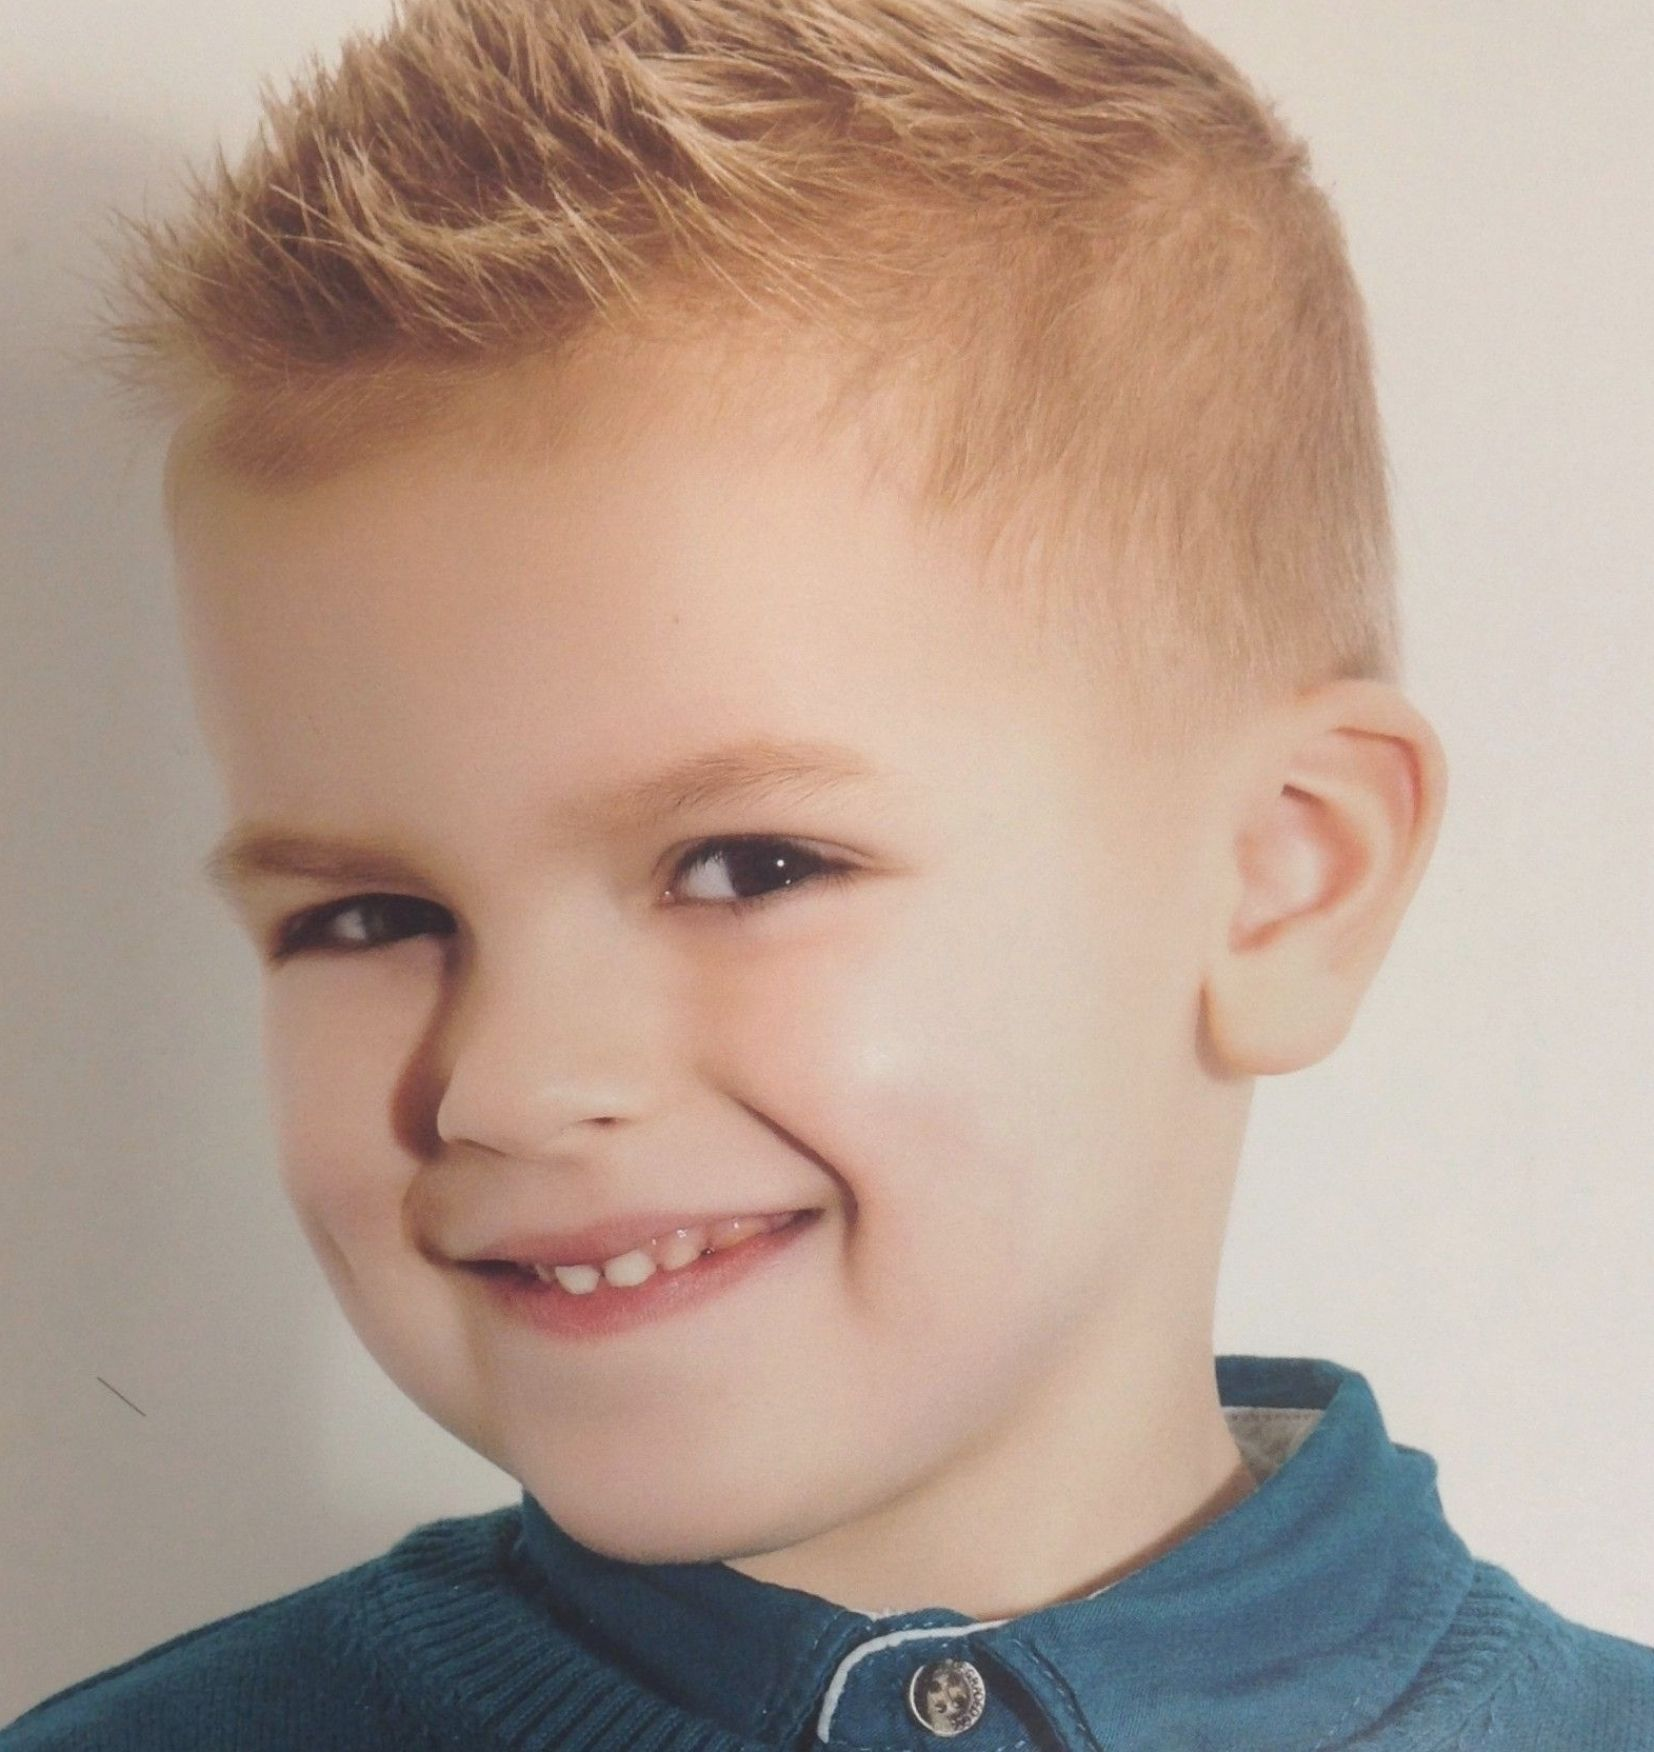 Haircut For 9 Year Old Boys - Wavy Haircut